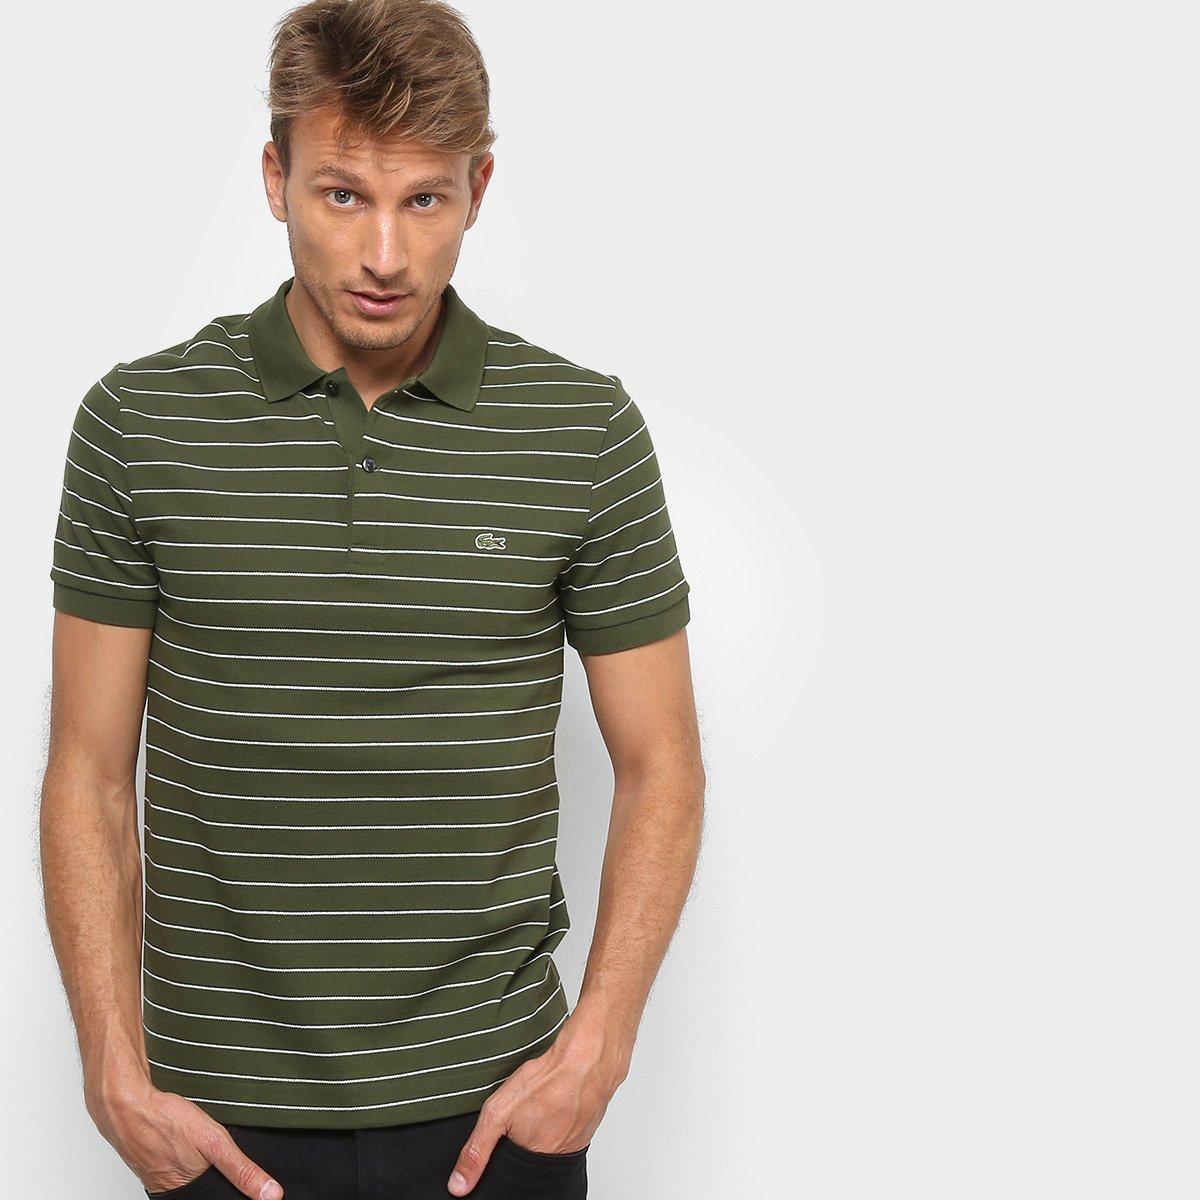 Camisa Polo Lacoste Listrada Masculina - Verde Militar - Compre . 62422184b3